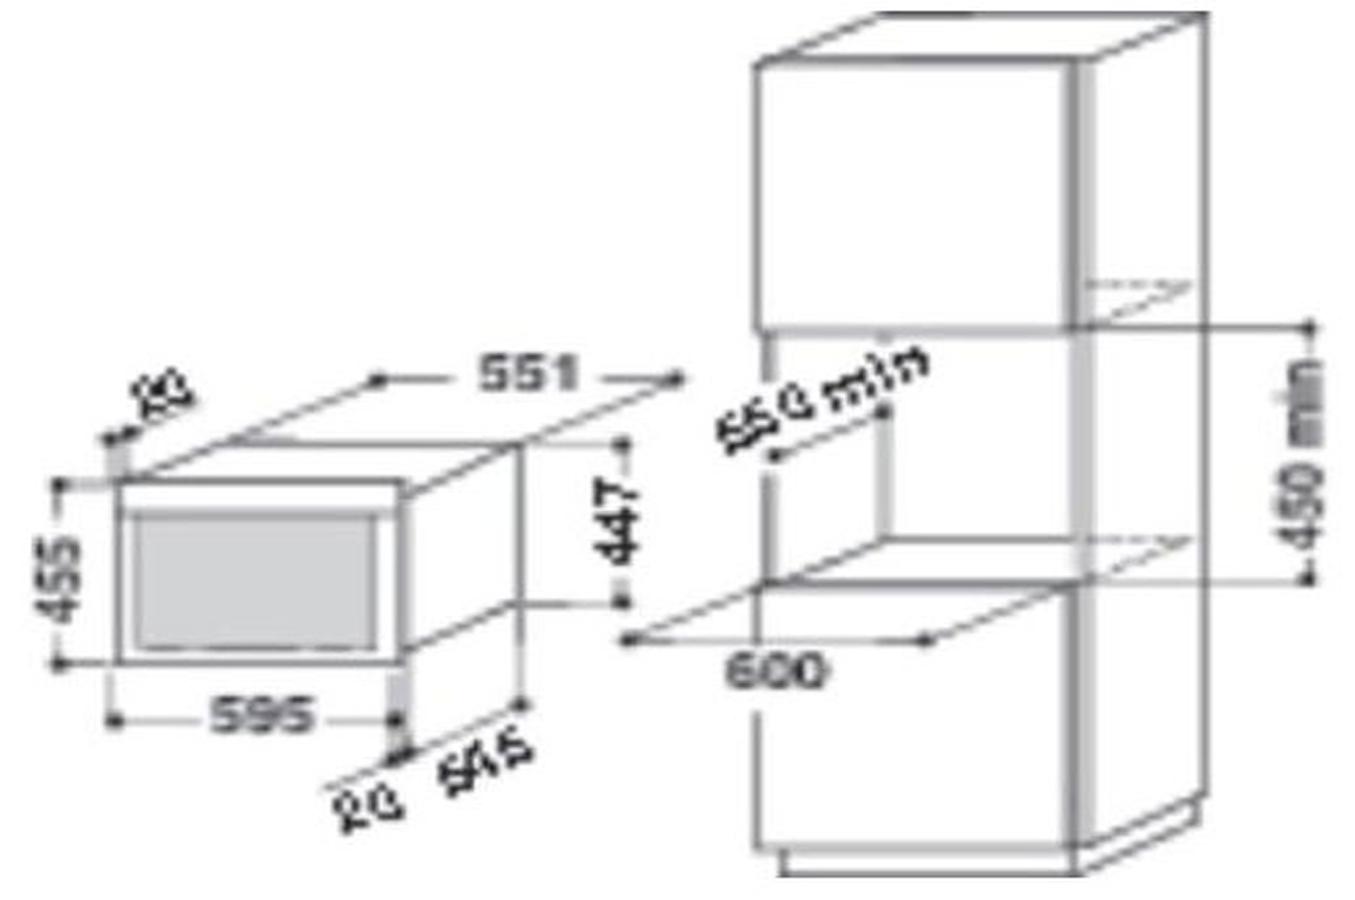 micro ondes combin encastrable whirlpool amw825ix amw825ix inox 3120350 darty. Black Bedroom Furniture Sets. Home Design Ideas